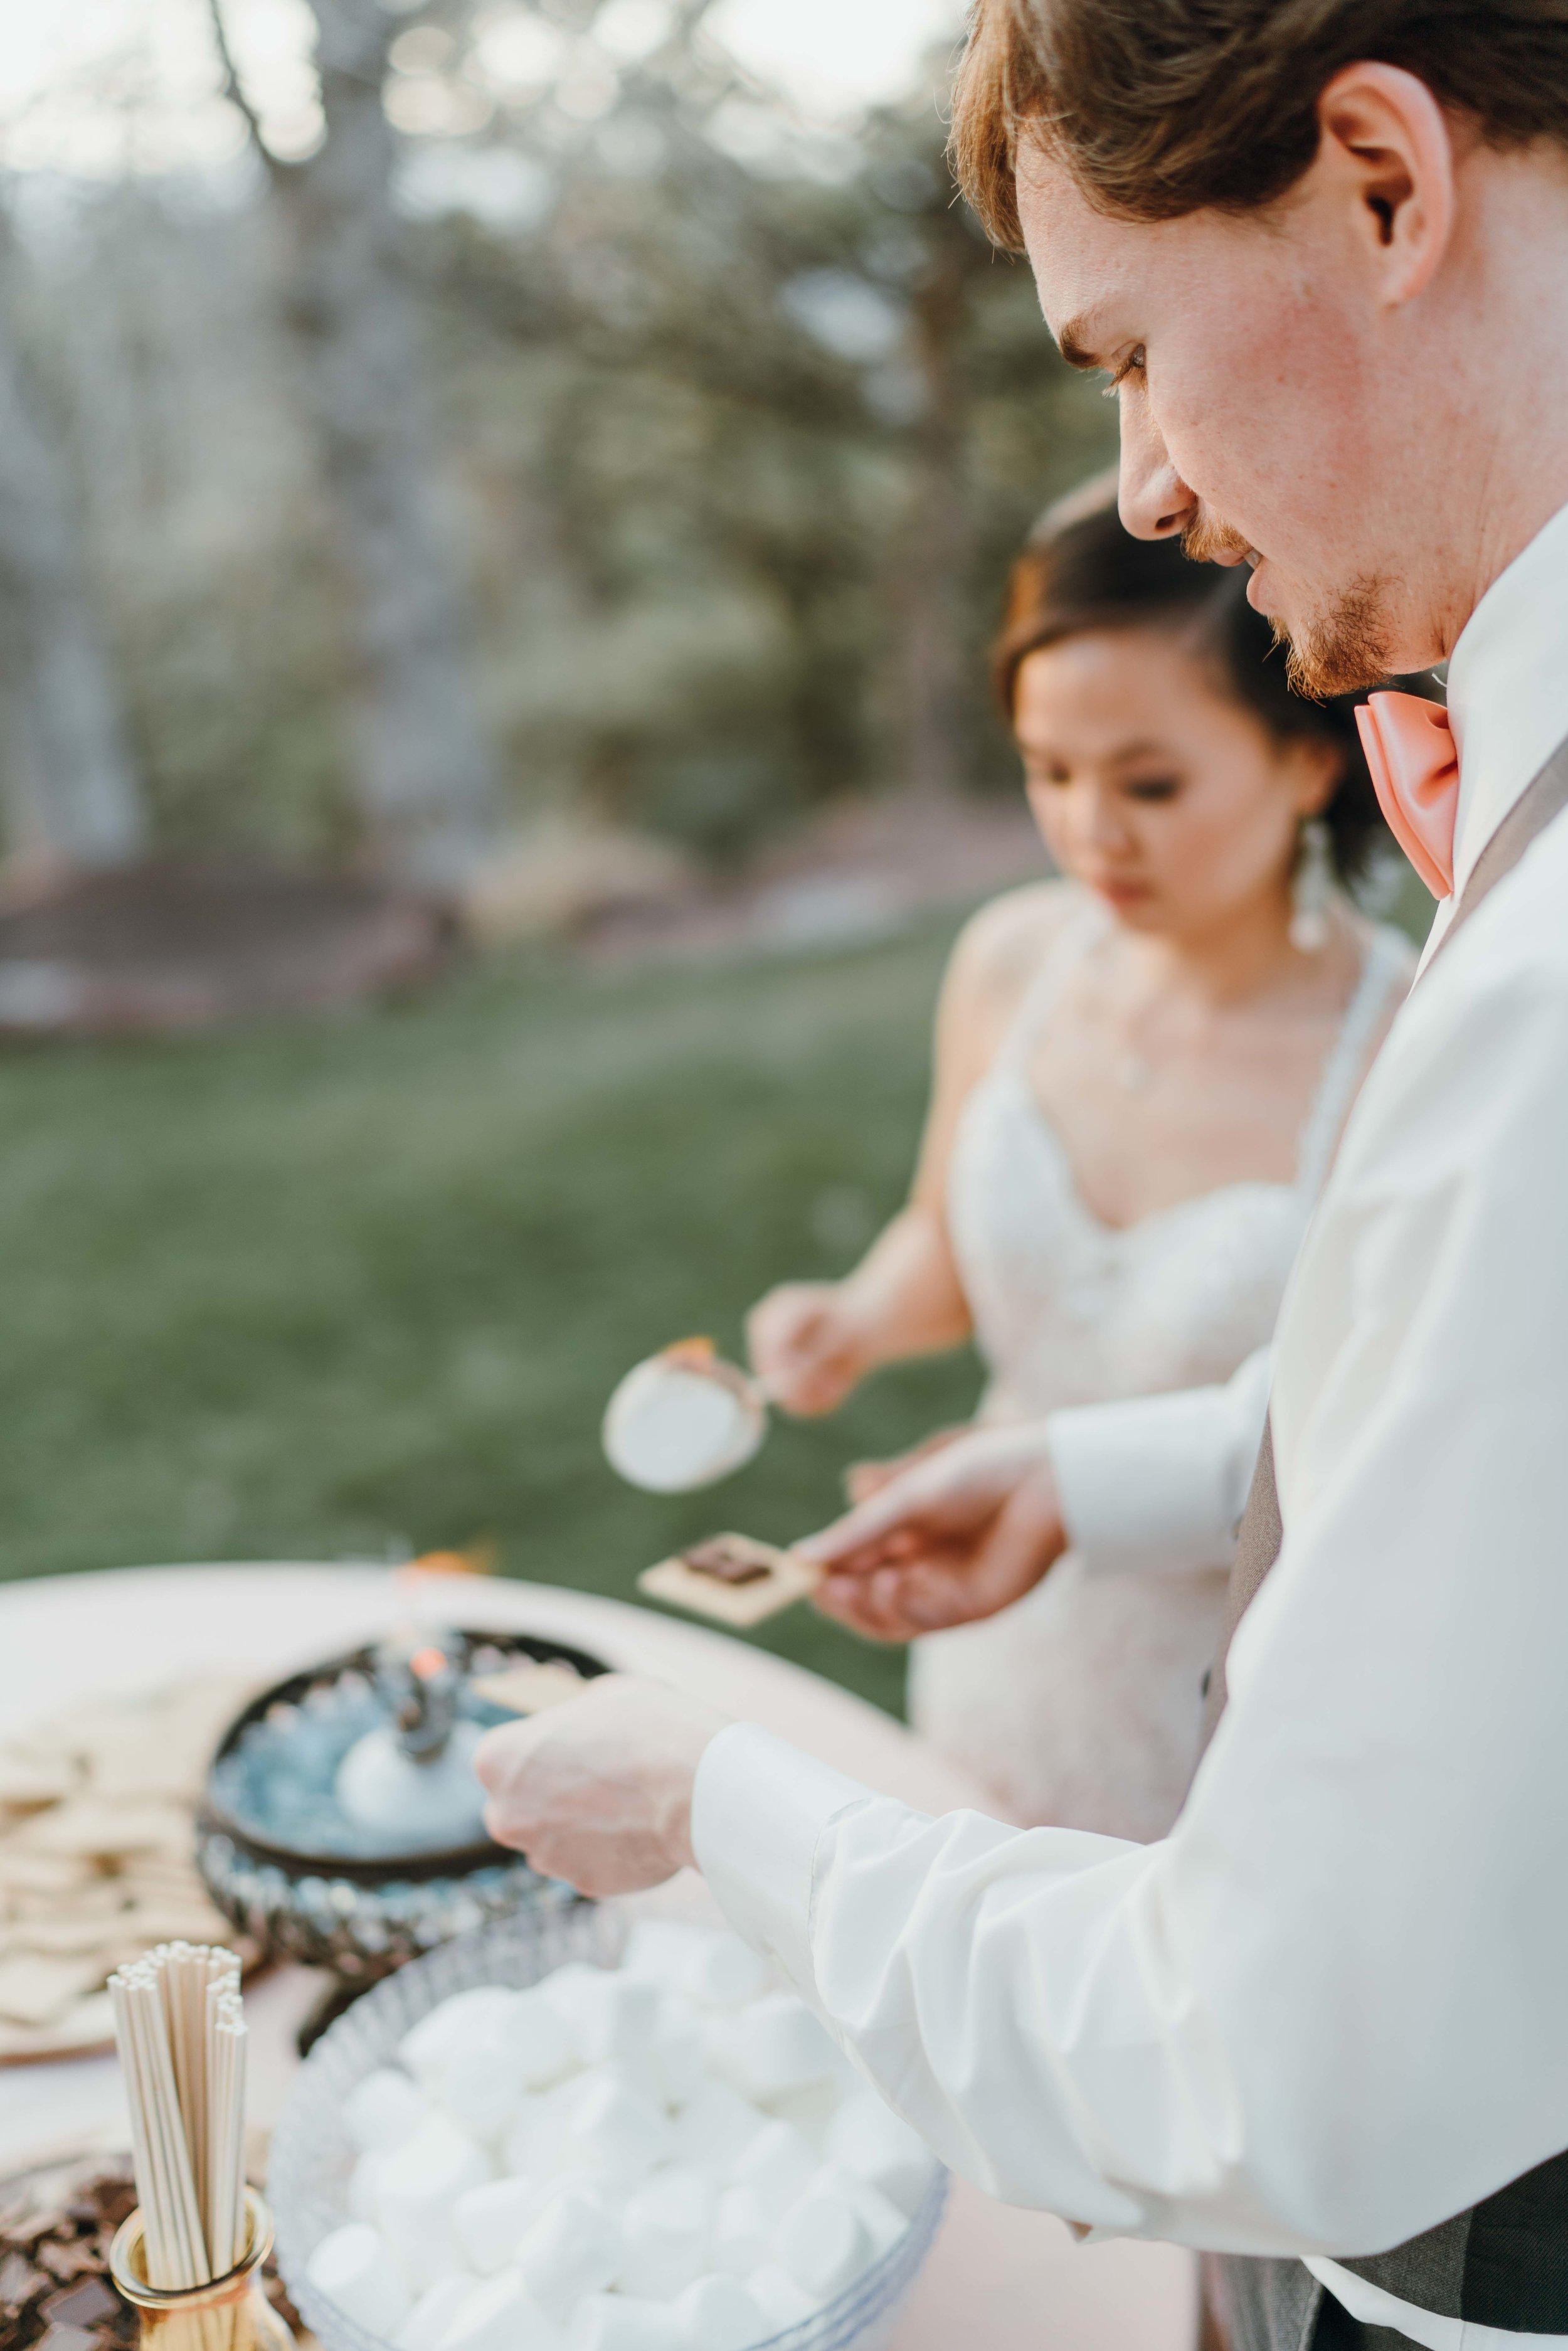 denver wedding photographer lioncrest manor in lyons ben and mali -DSC06776.jpg